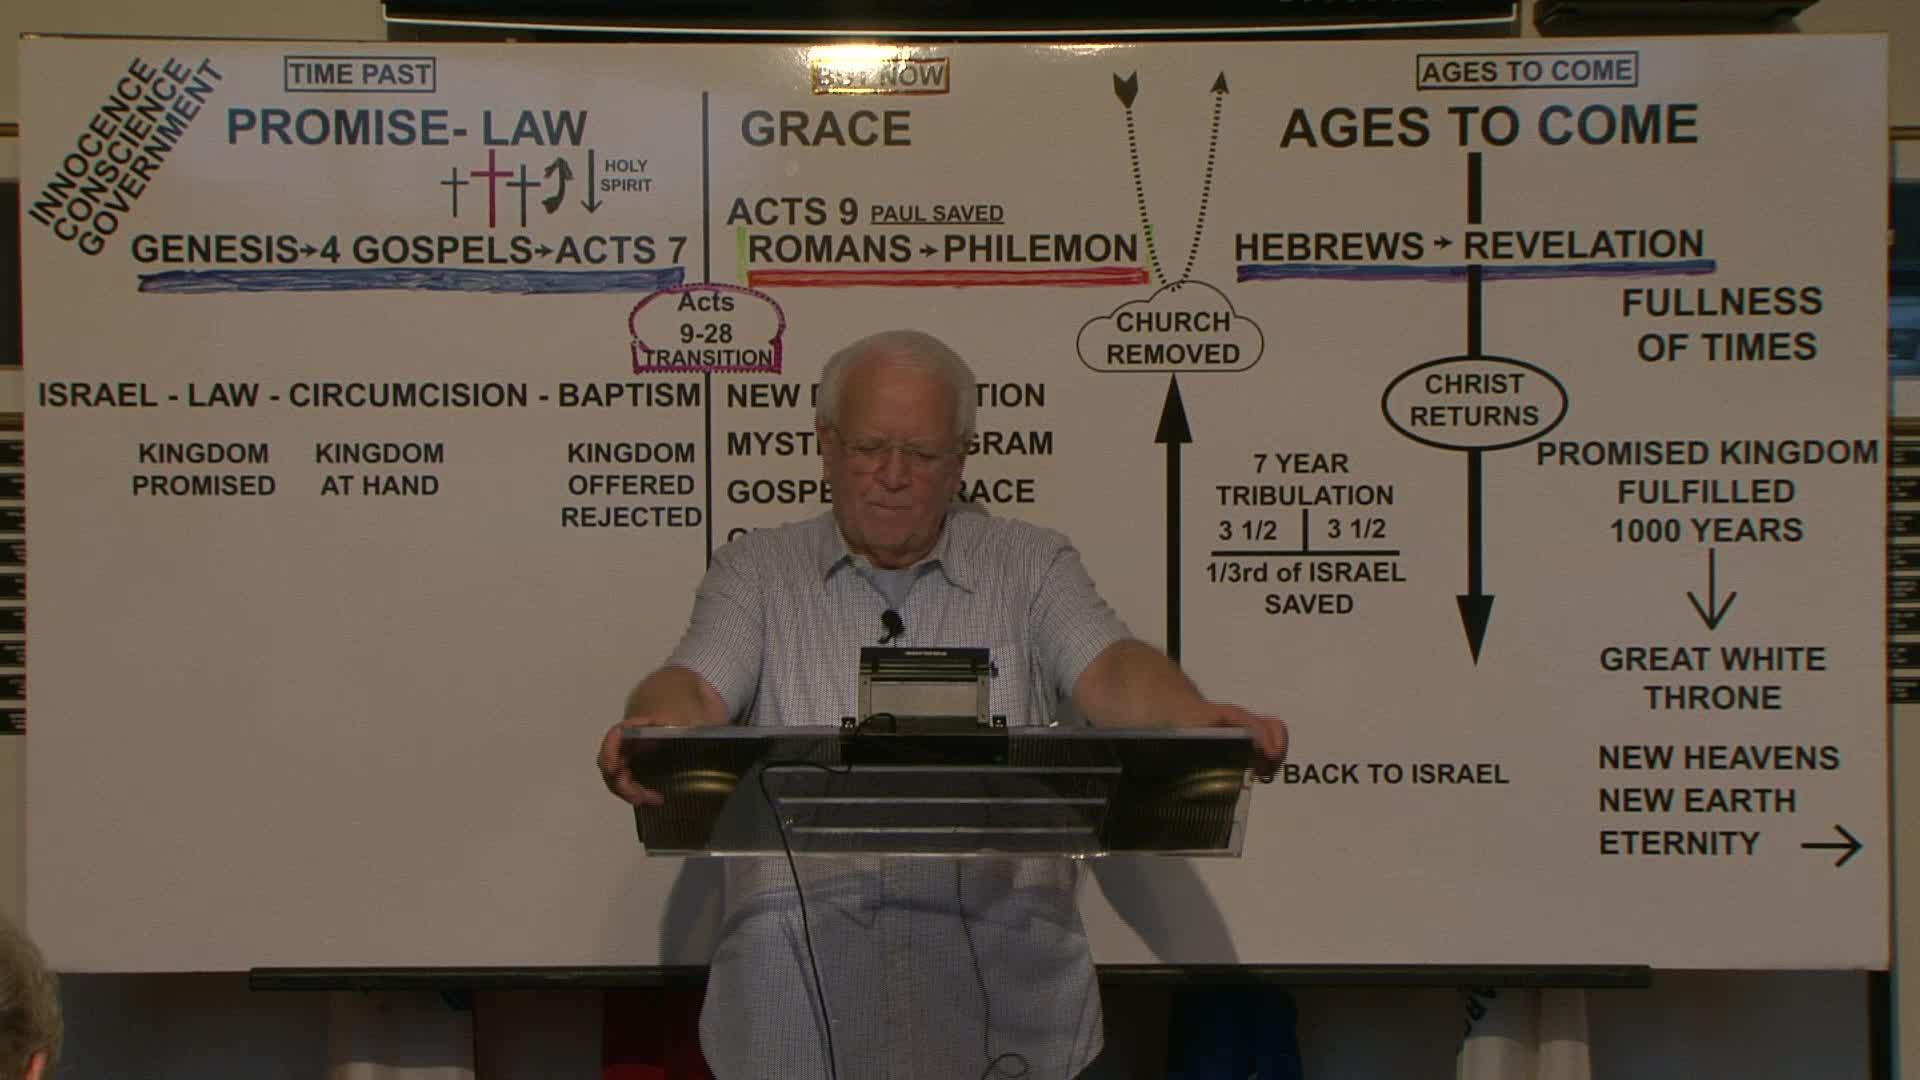 8-18-21 Revelation 2: 8-11